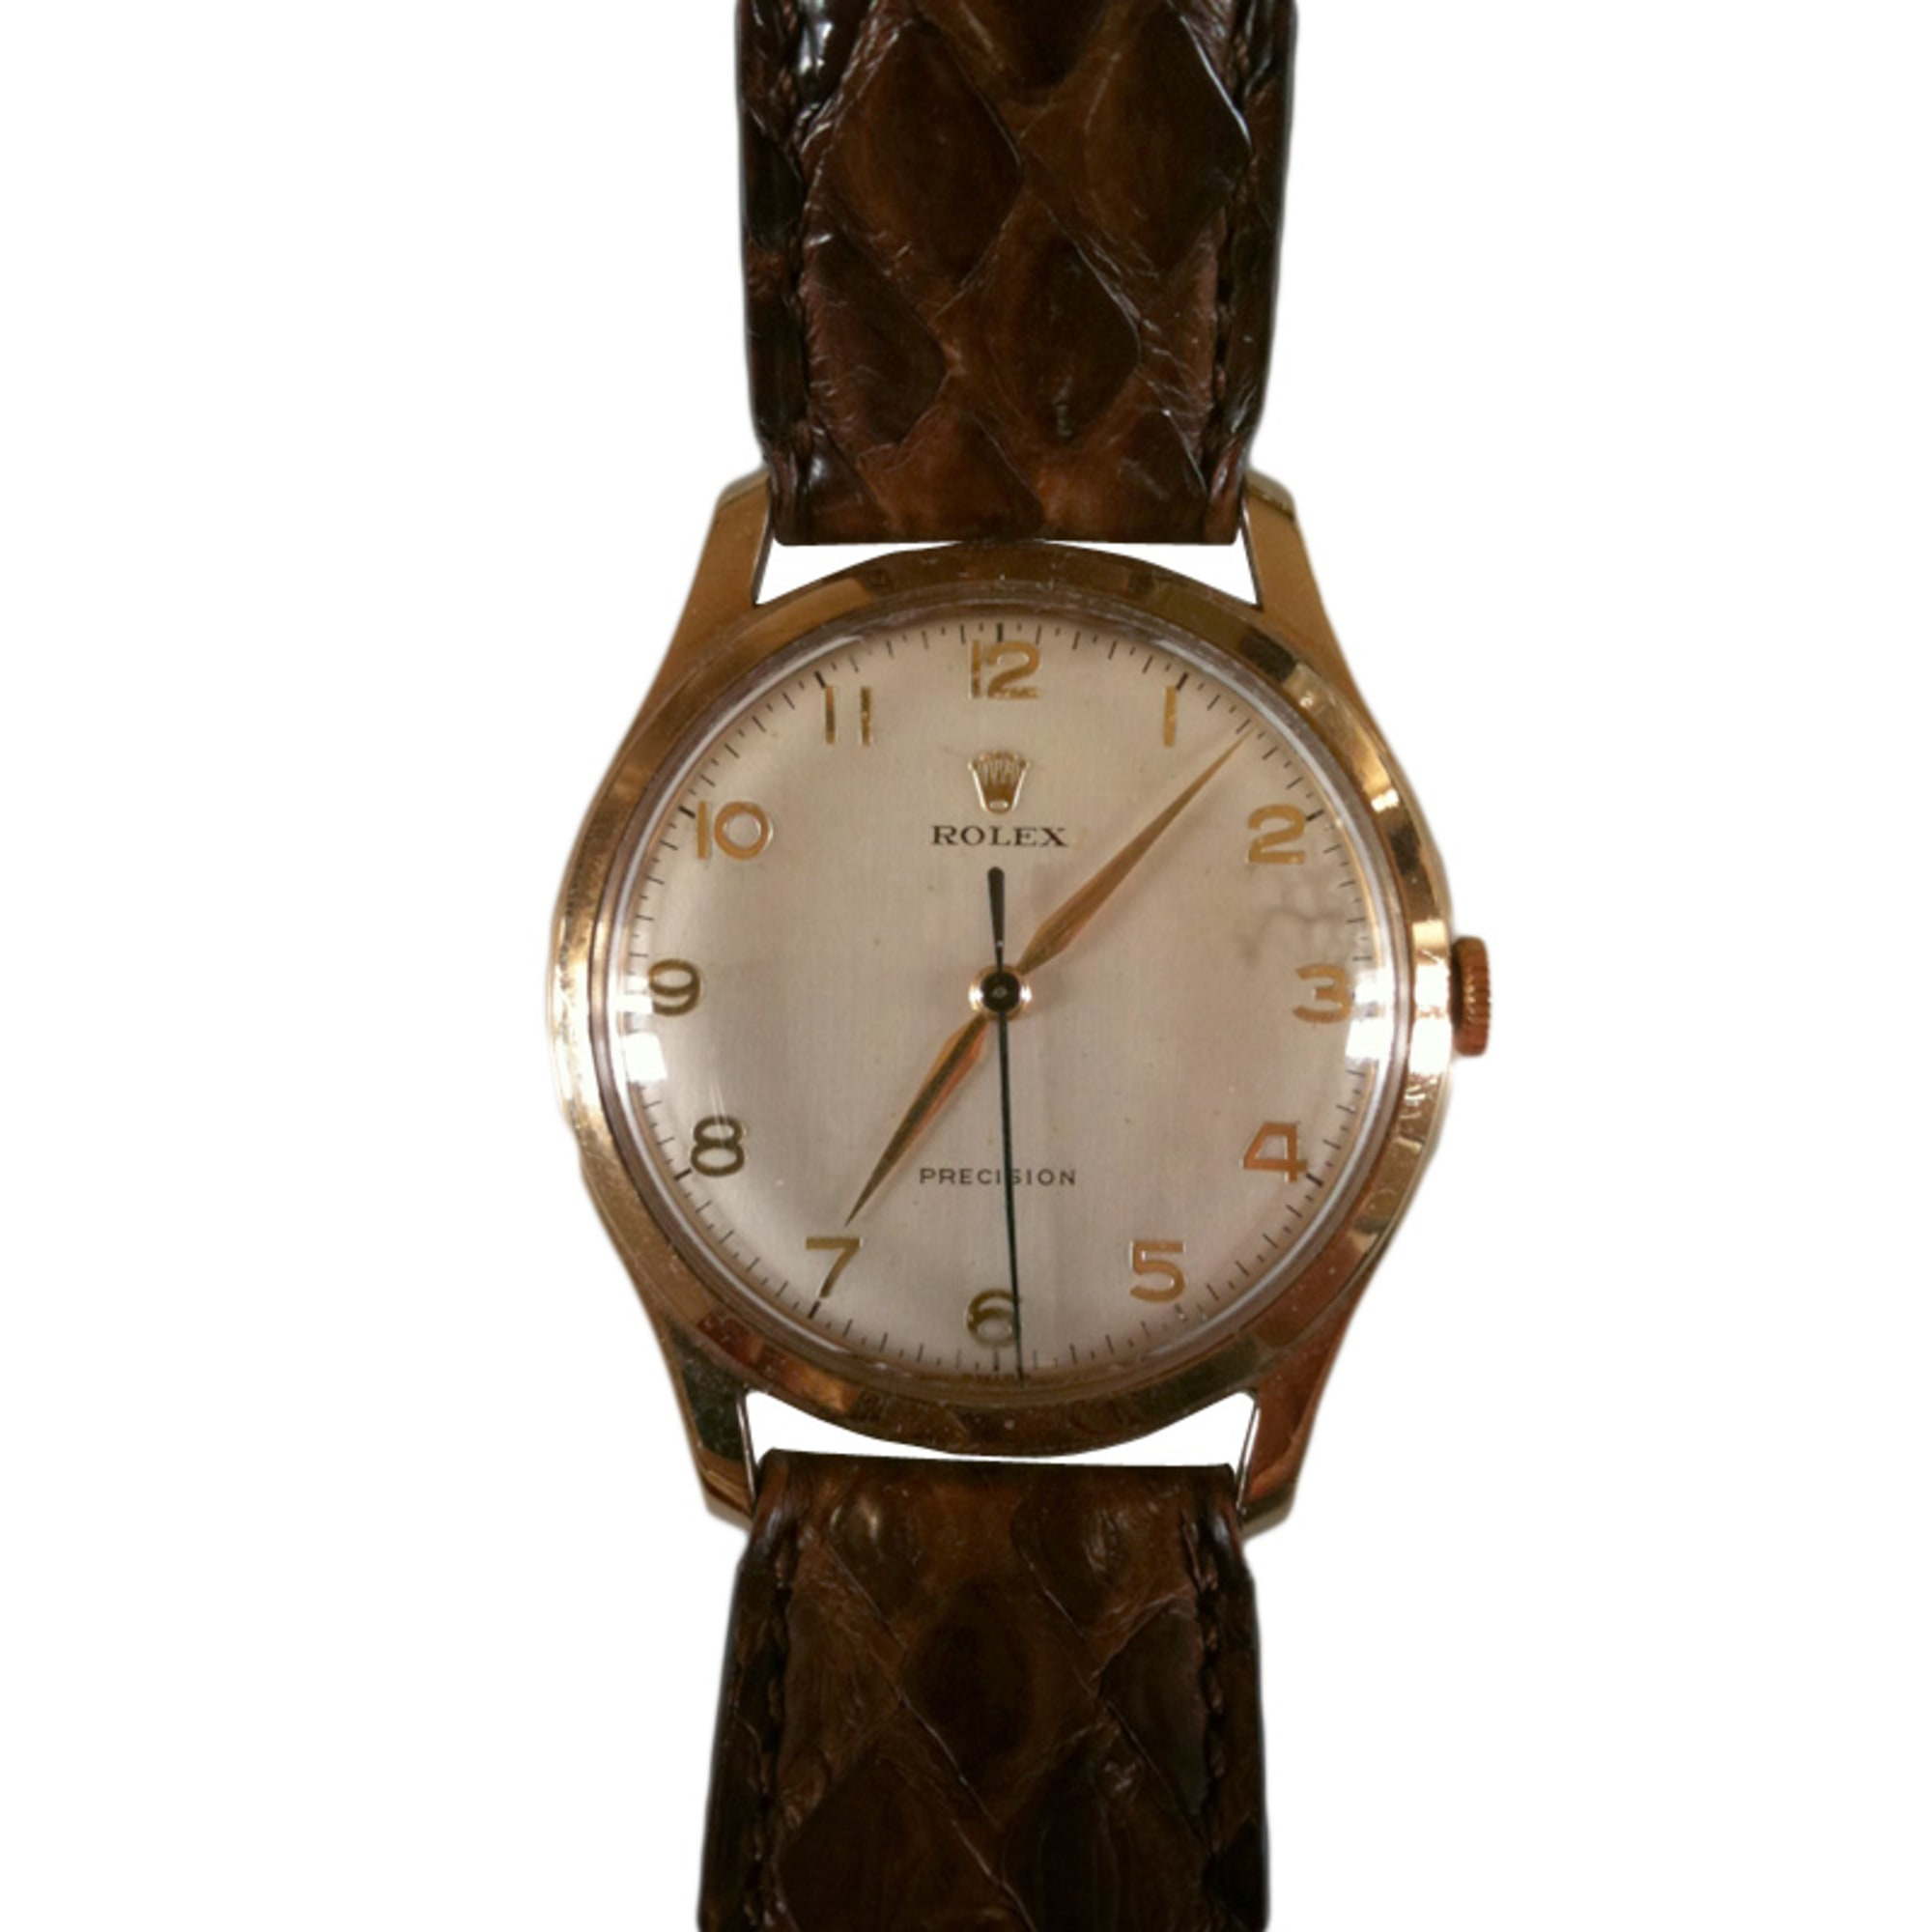 Armbanduhr ROLEX Gold, Bronze, Kupfer